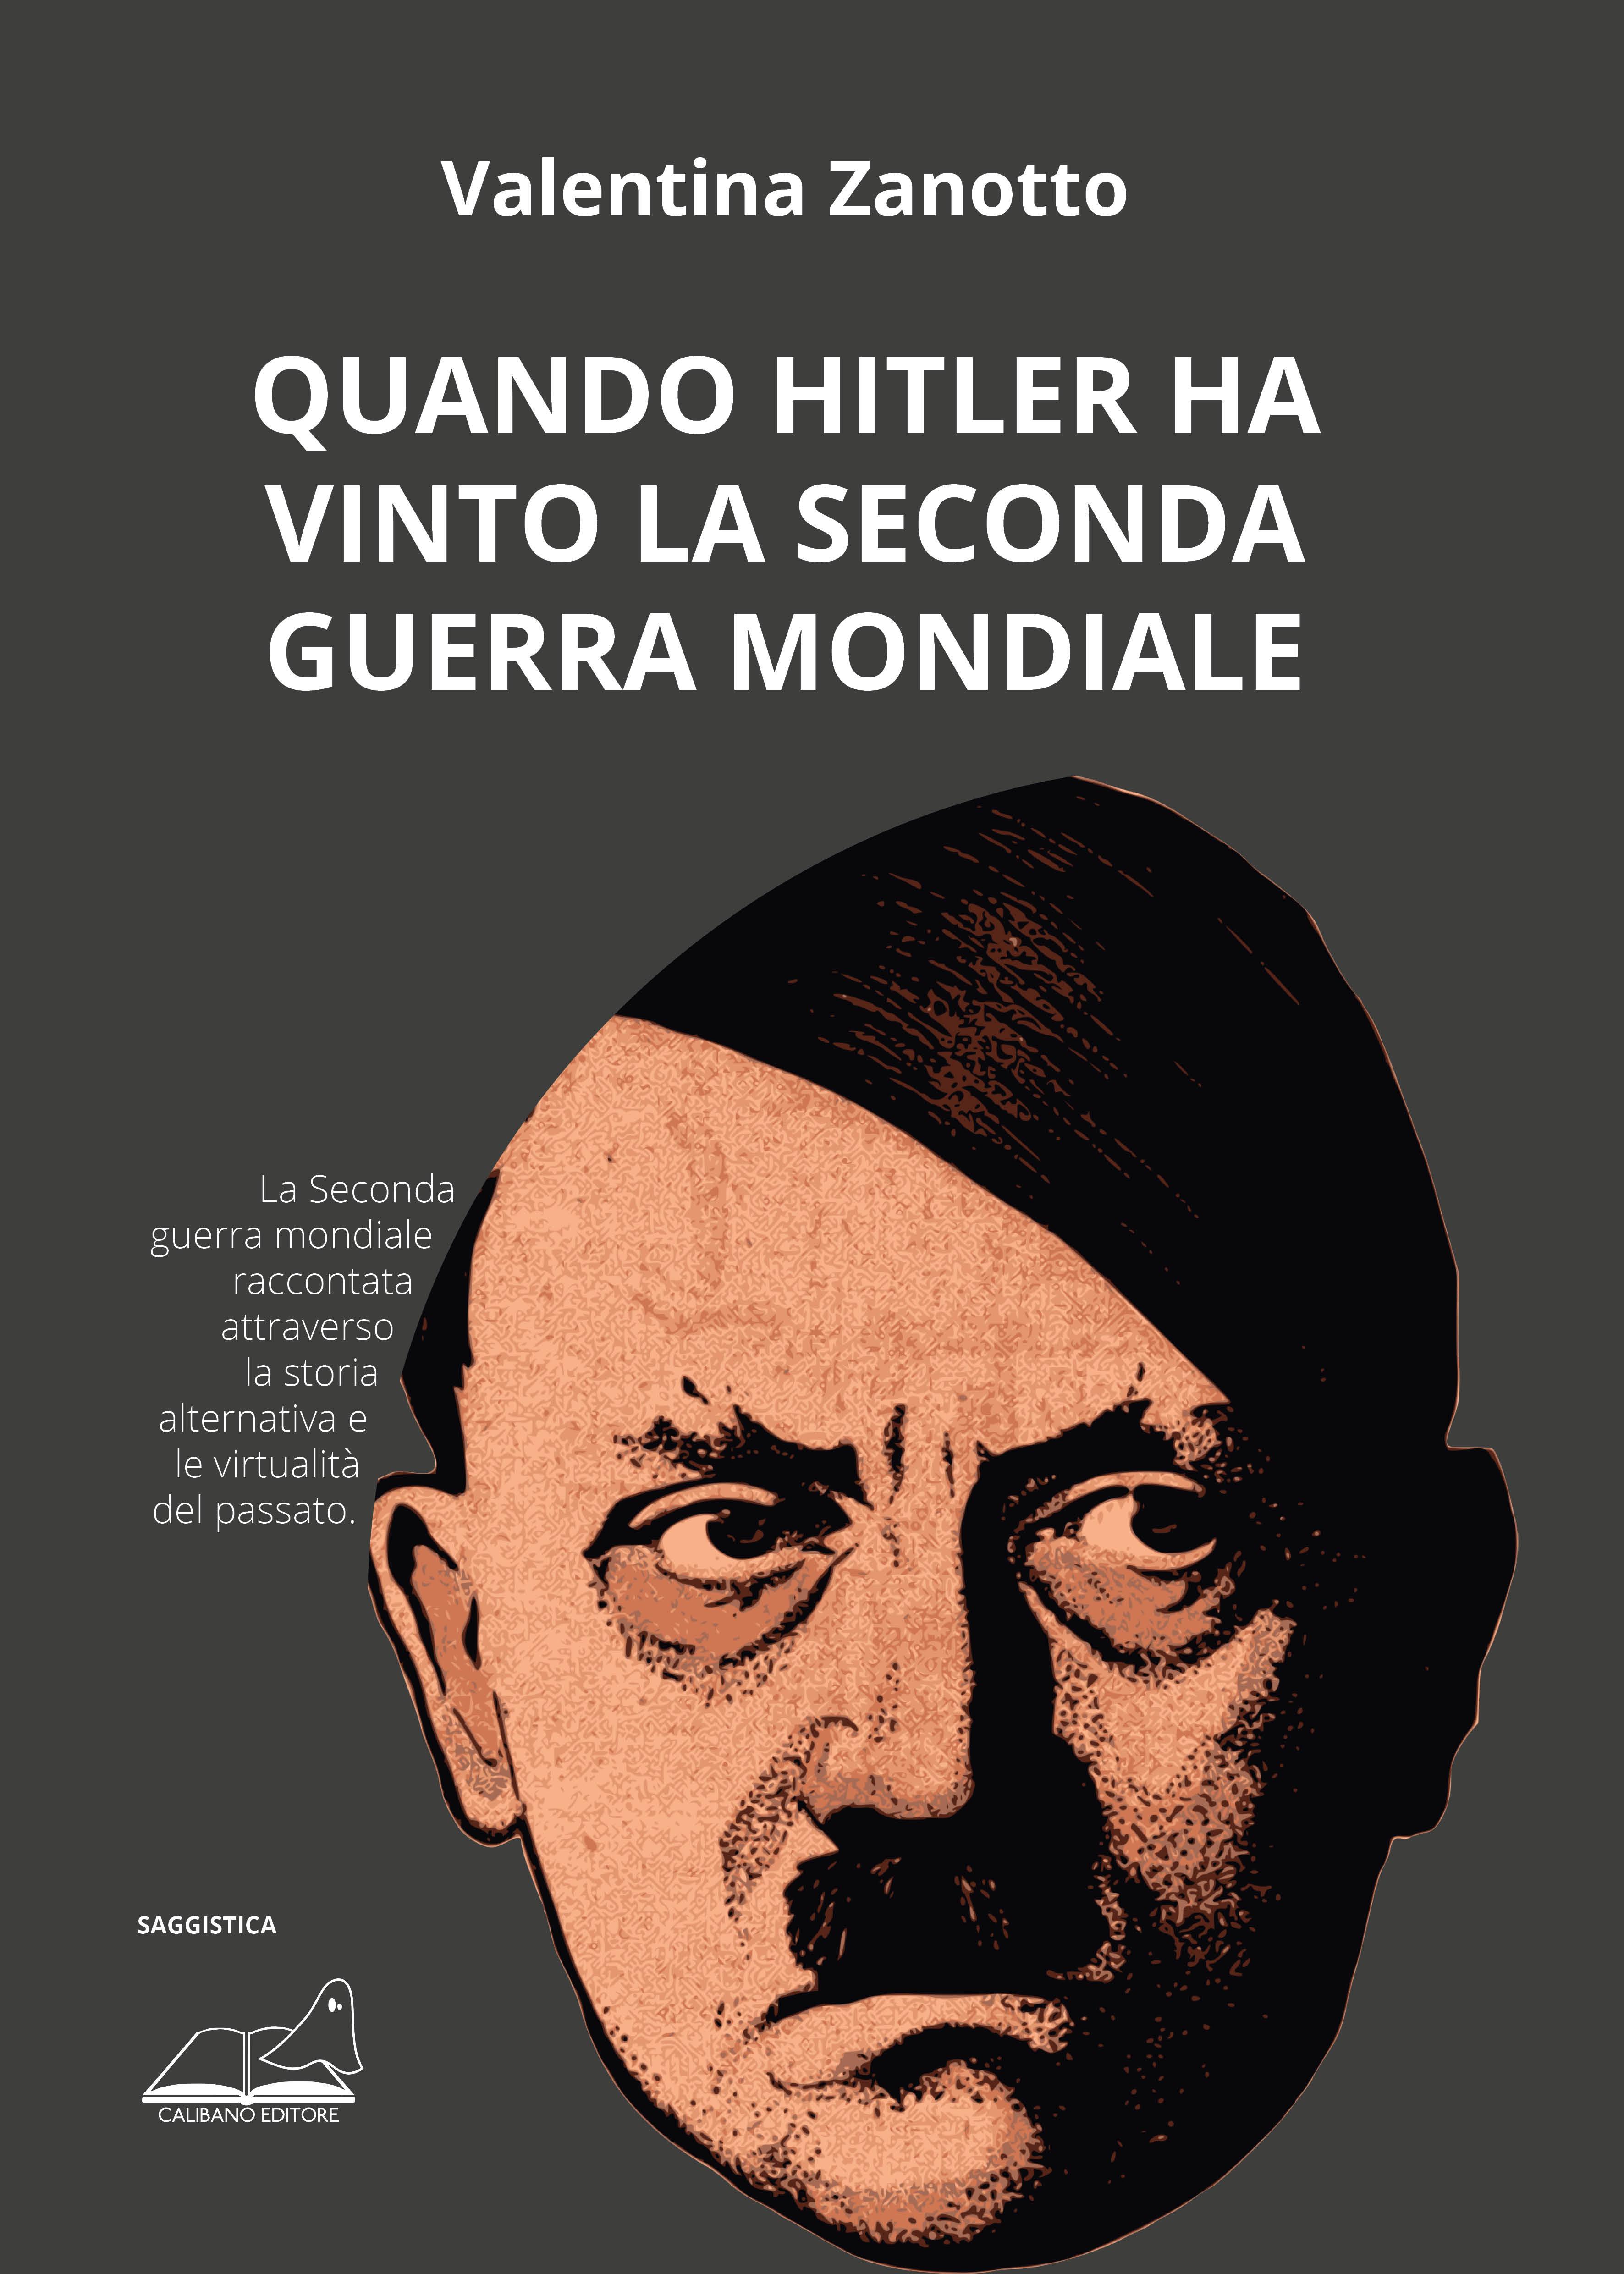 Quando Hitler ha vinto la Seconda guerra mondiale-image-1%>